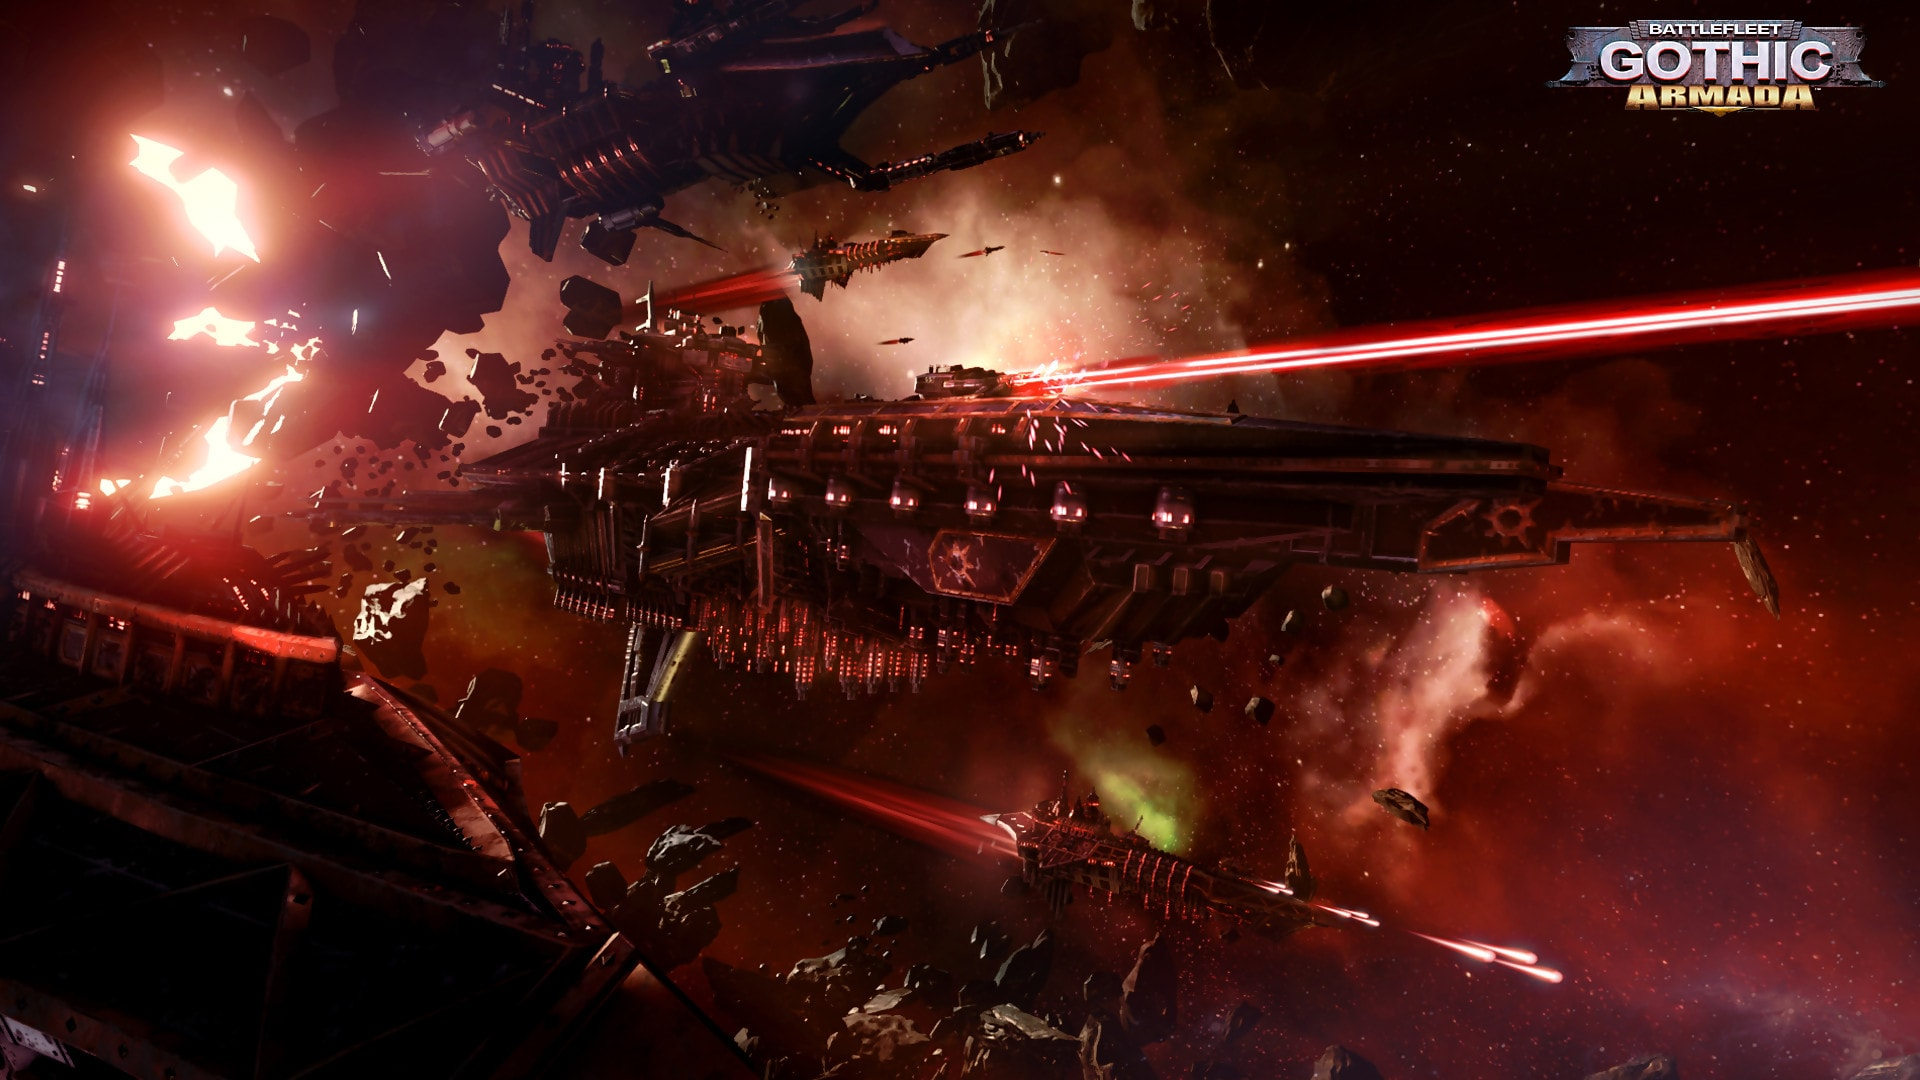 Battlefleet Gothic: Armada HQ wallpapers